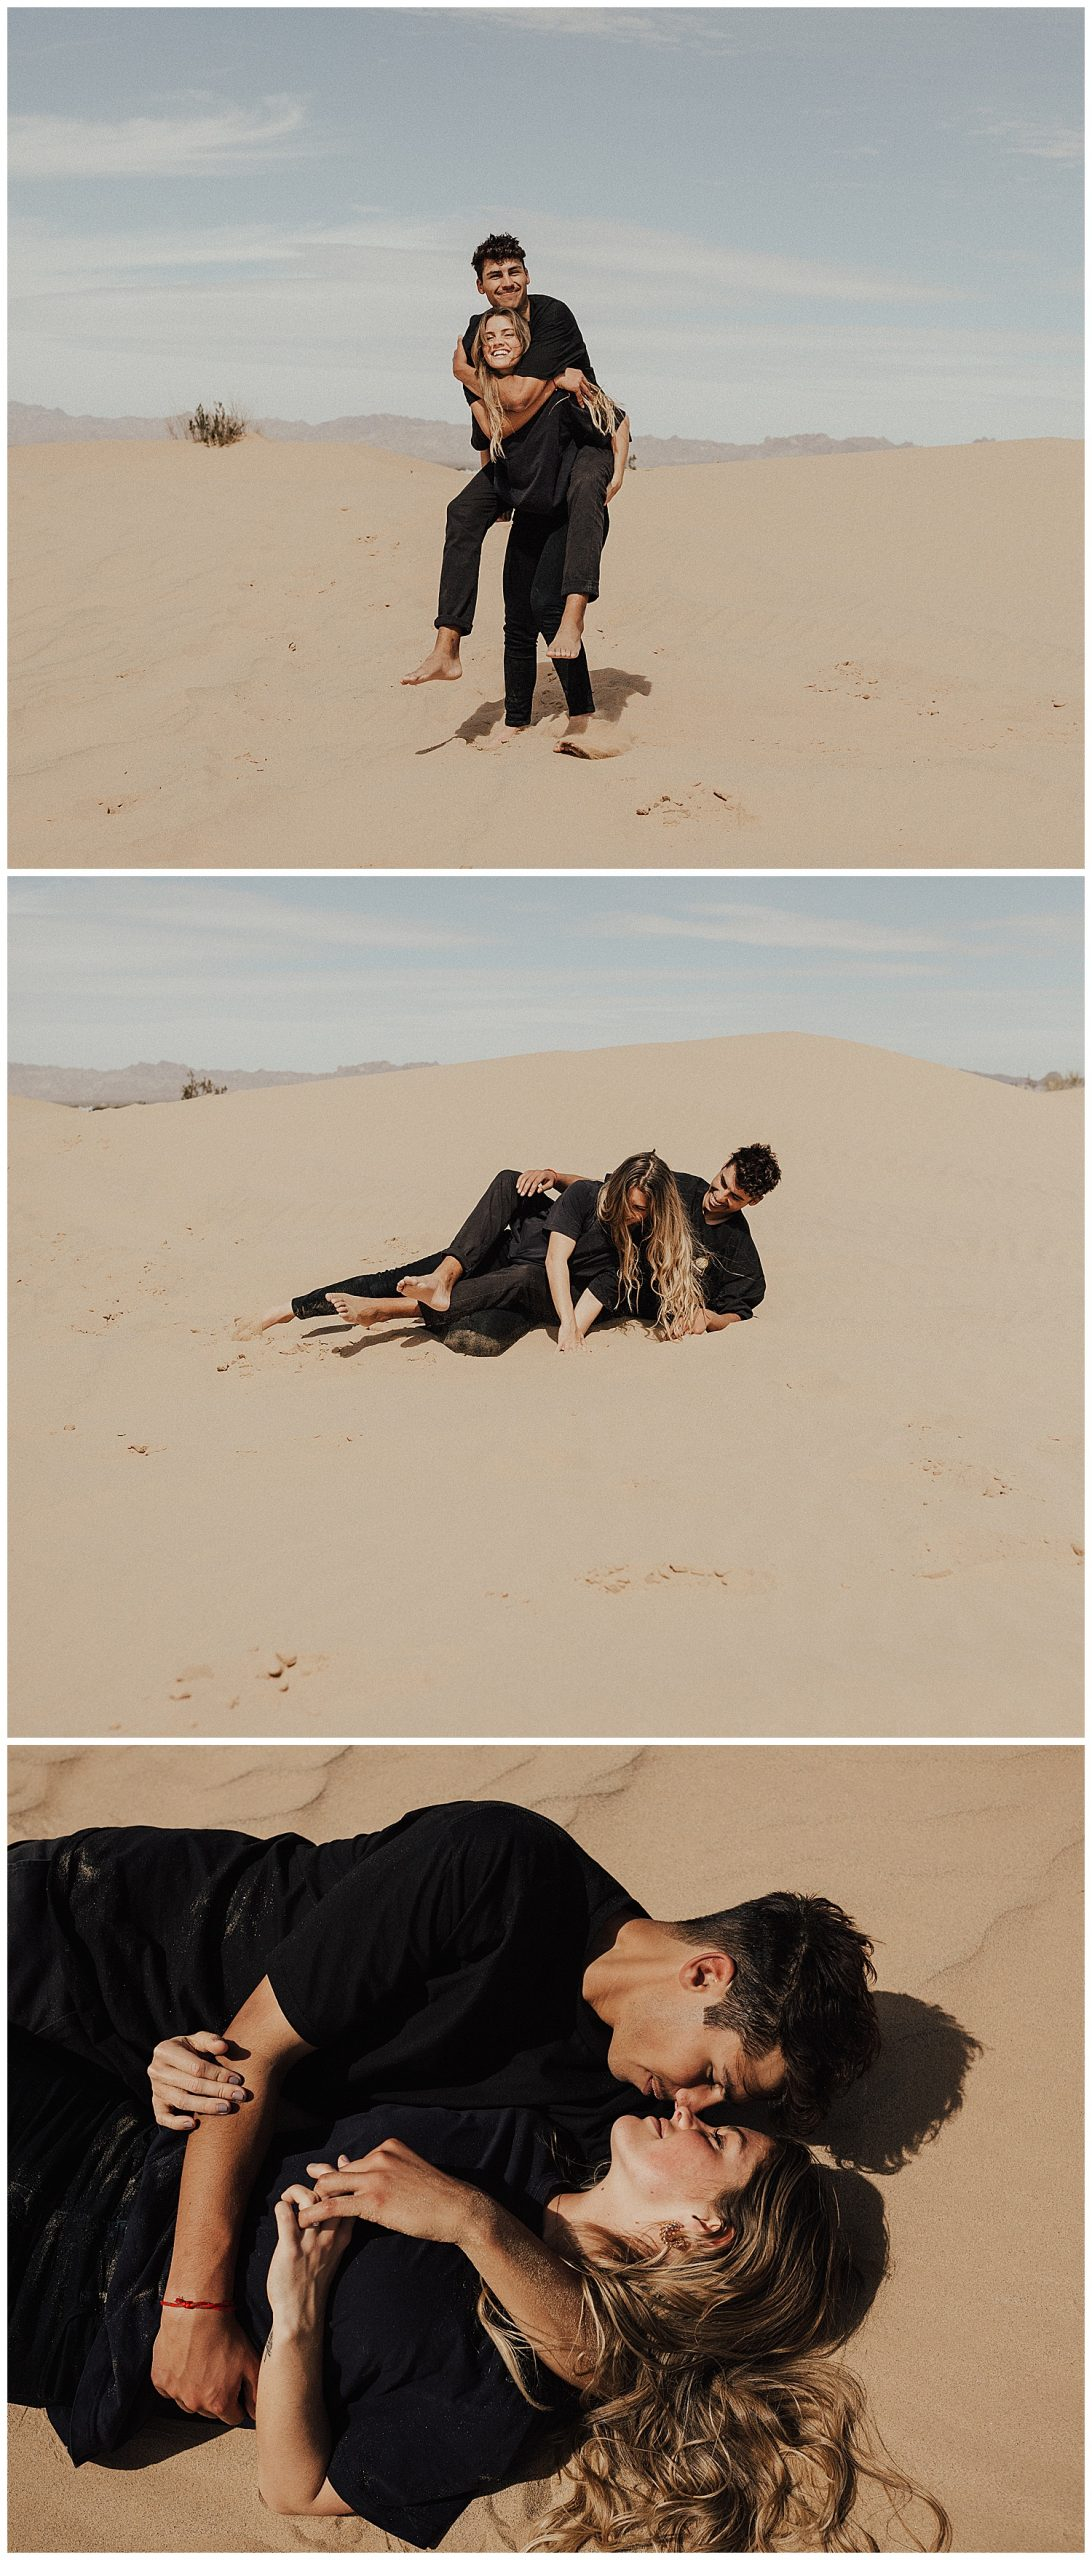 Glamis Sand Dunes Engagement photos, Engagement Photographer, elopement photographer, Sand dunes Engagement shoot, June Bug Weddings, Adventurous love story, hello may magazine